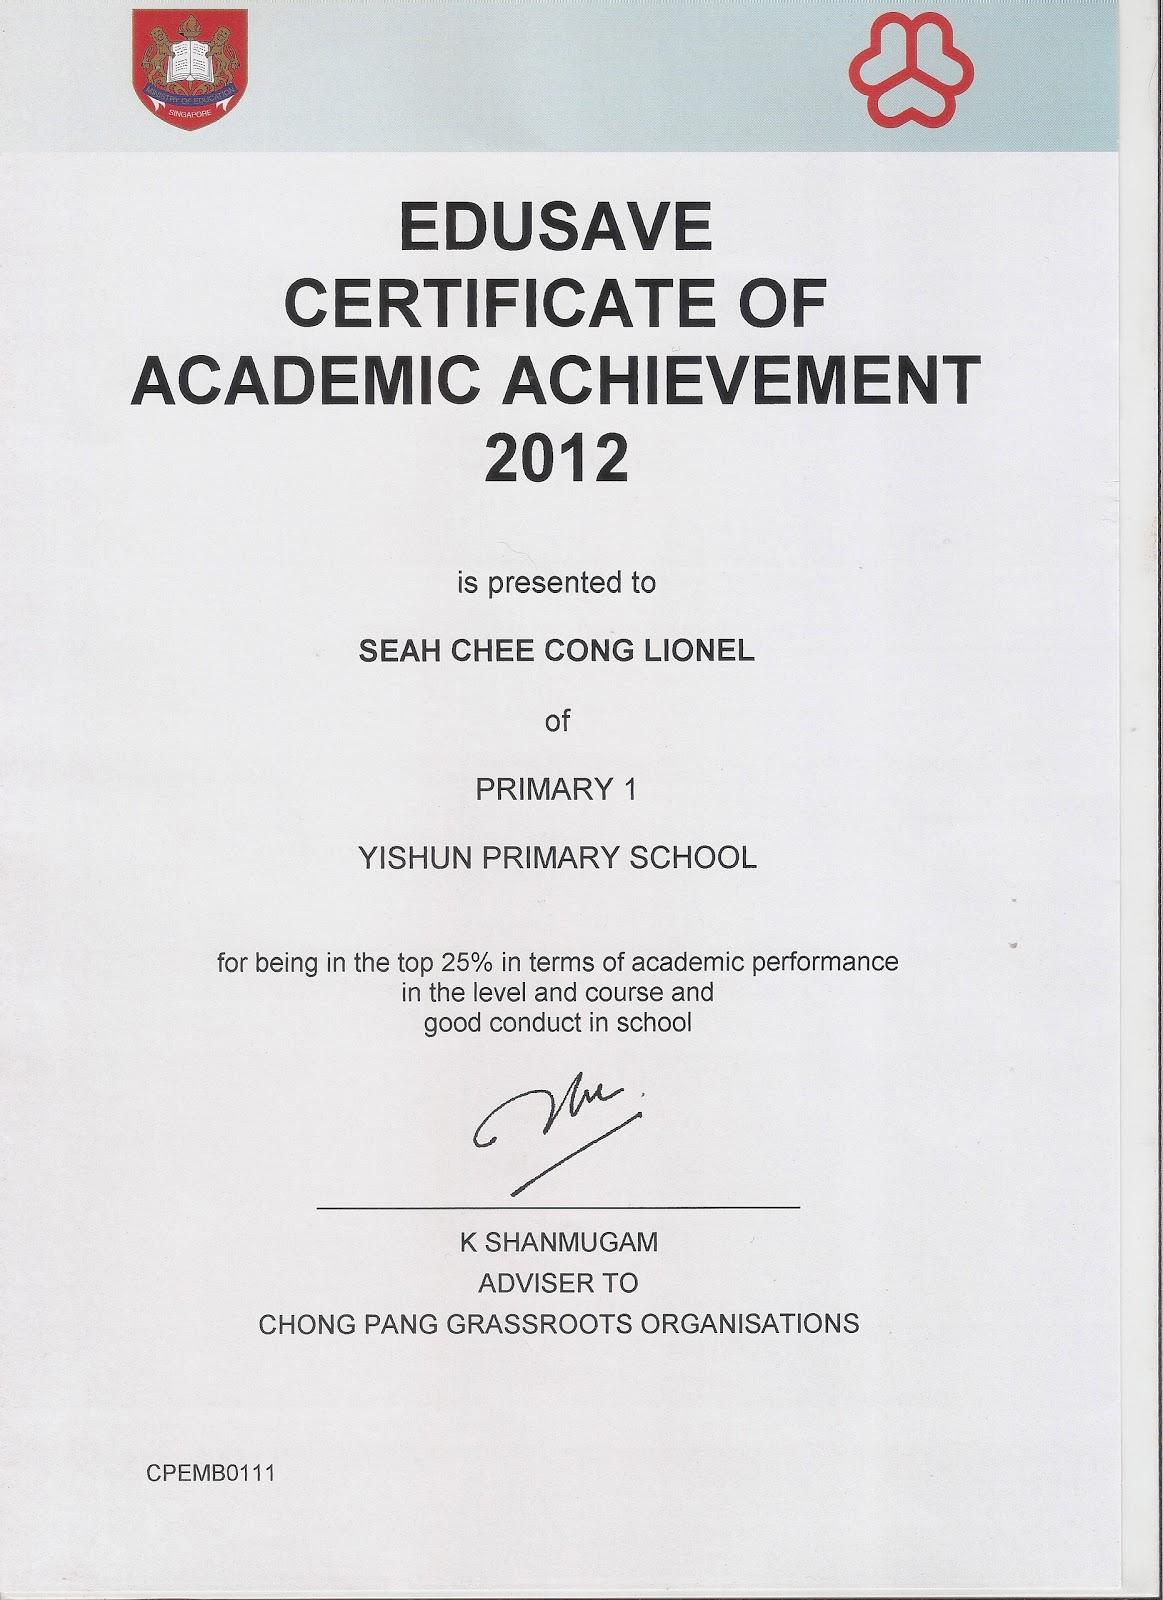 follow our footprints certificate of academic achievement